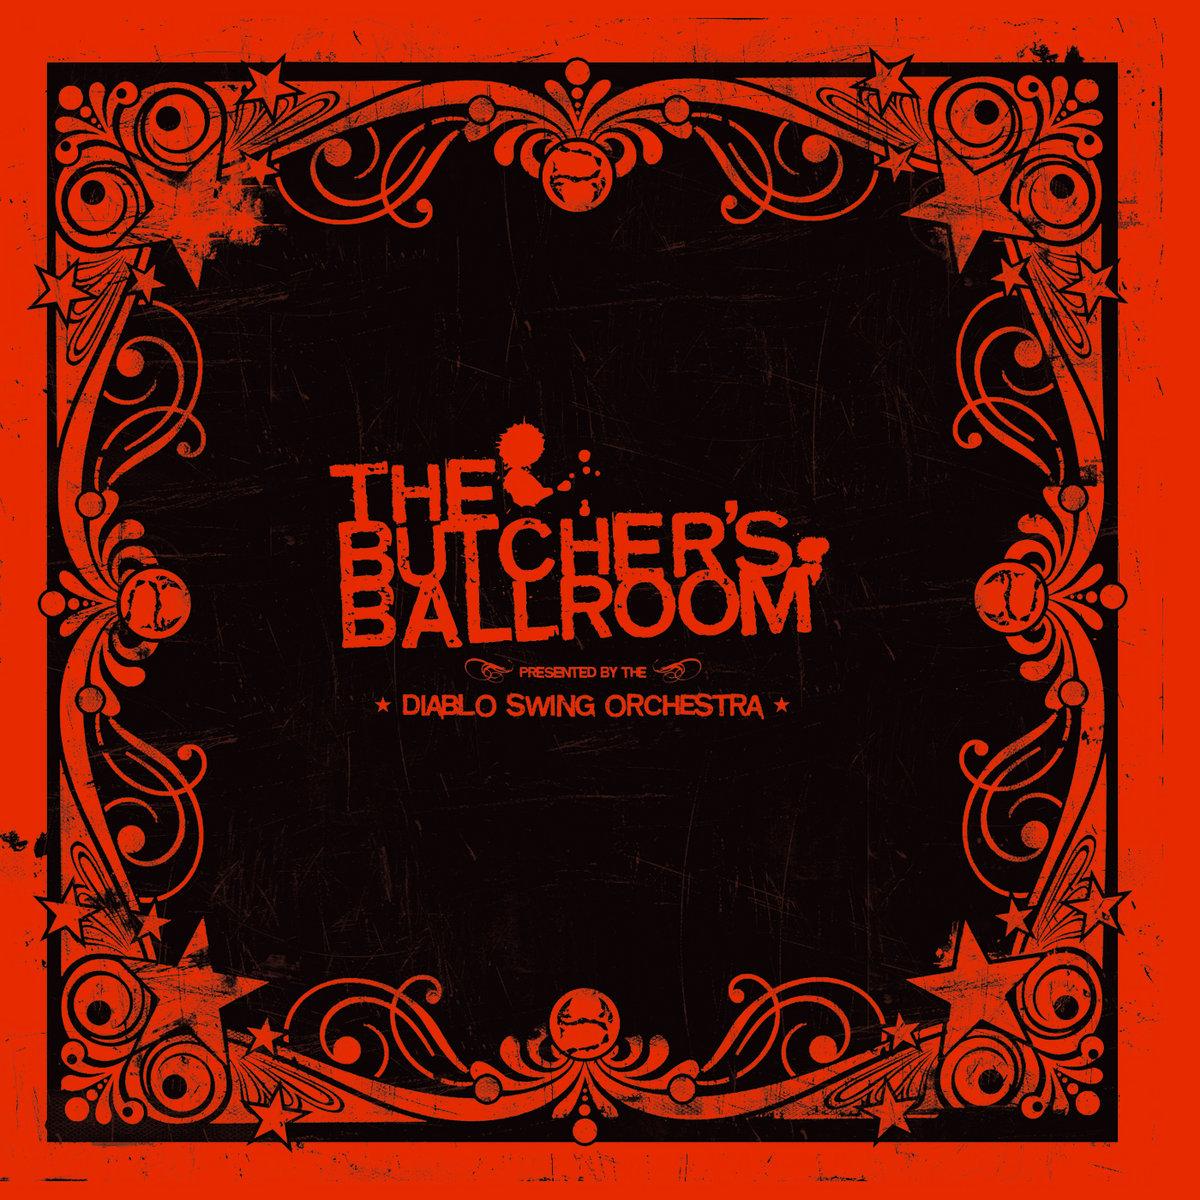 Diablo Swing Orchestra - The Butcher's Ballroom (Re-released 2007)